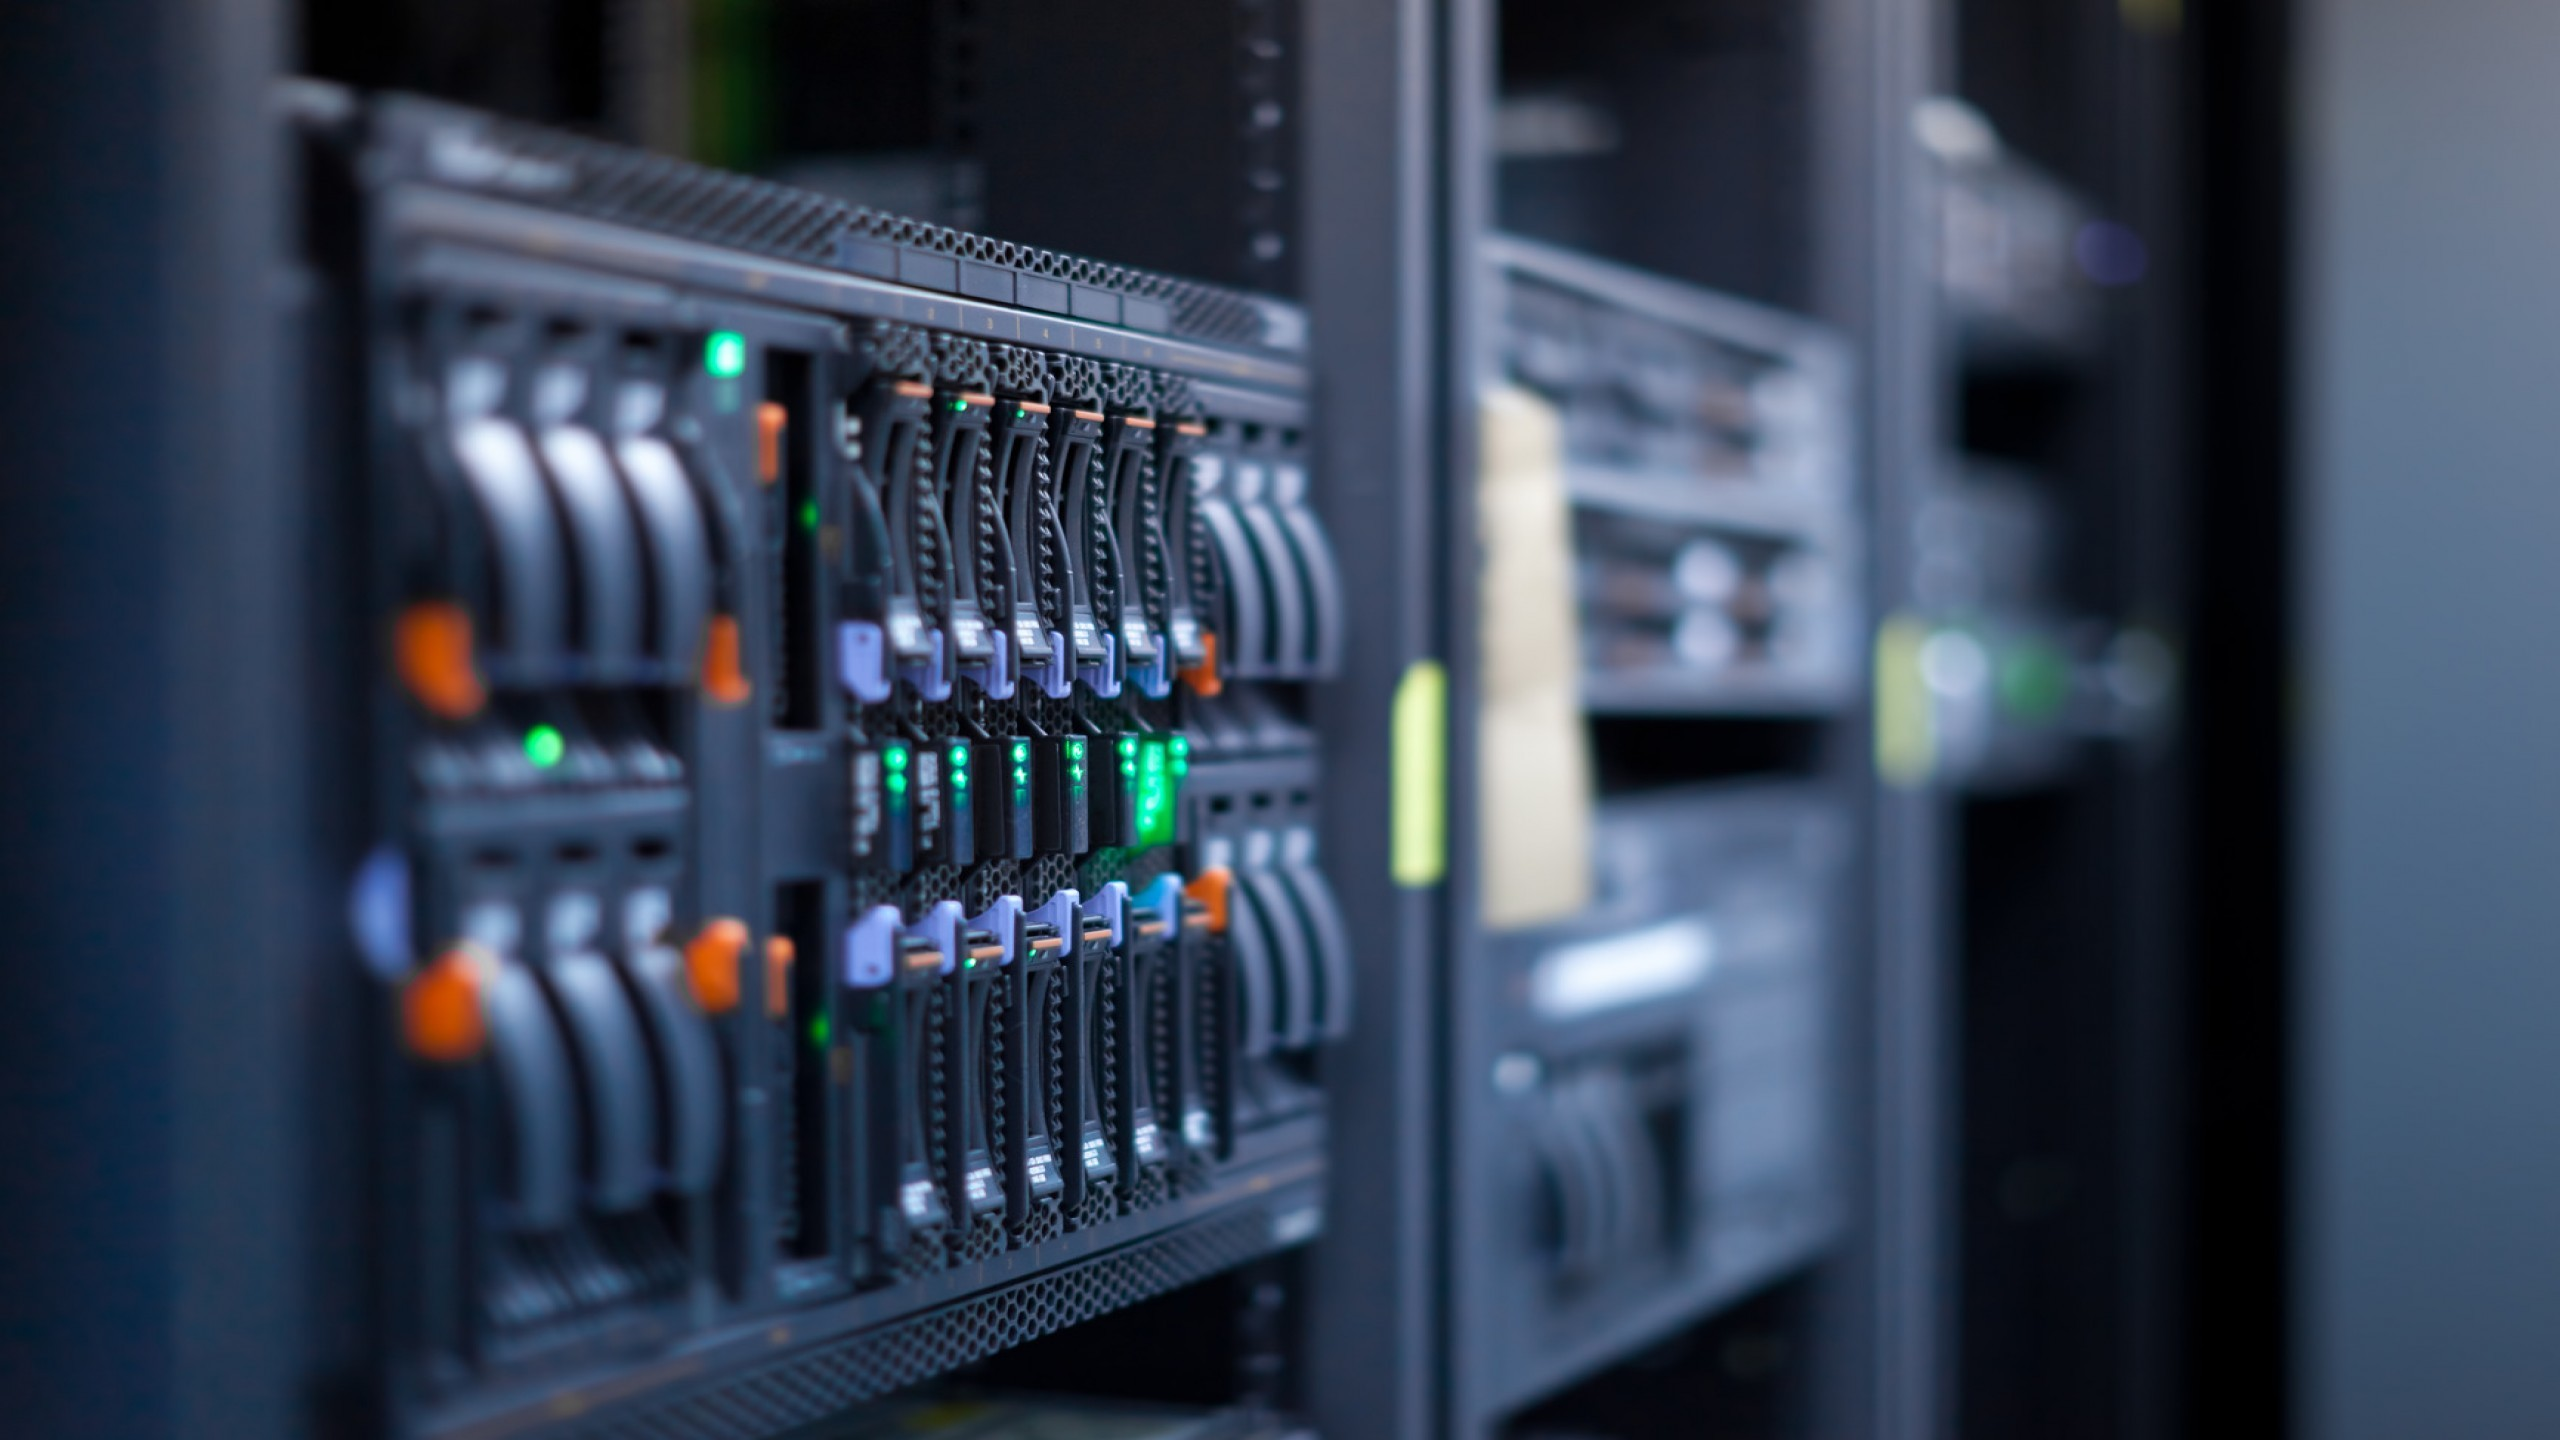 Distributor of SSD and Hard Drive Storage